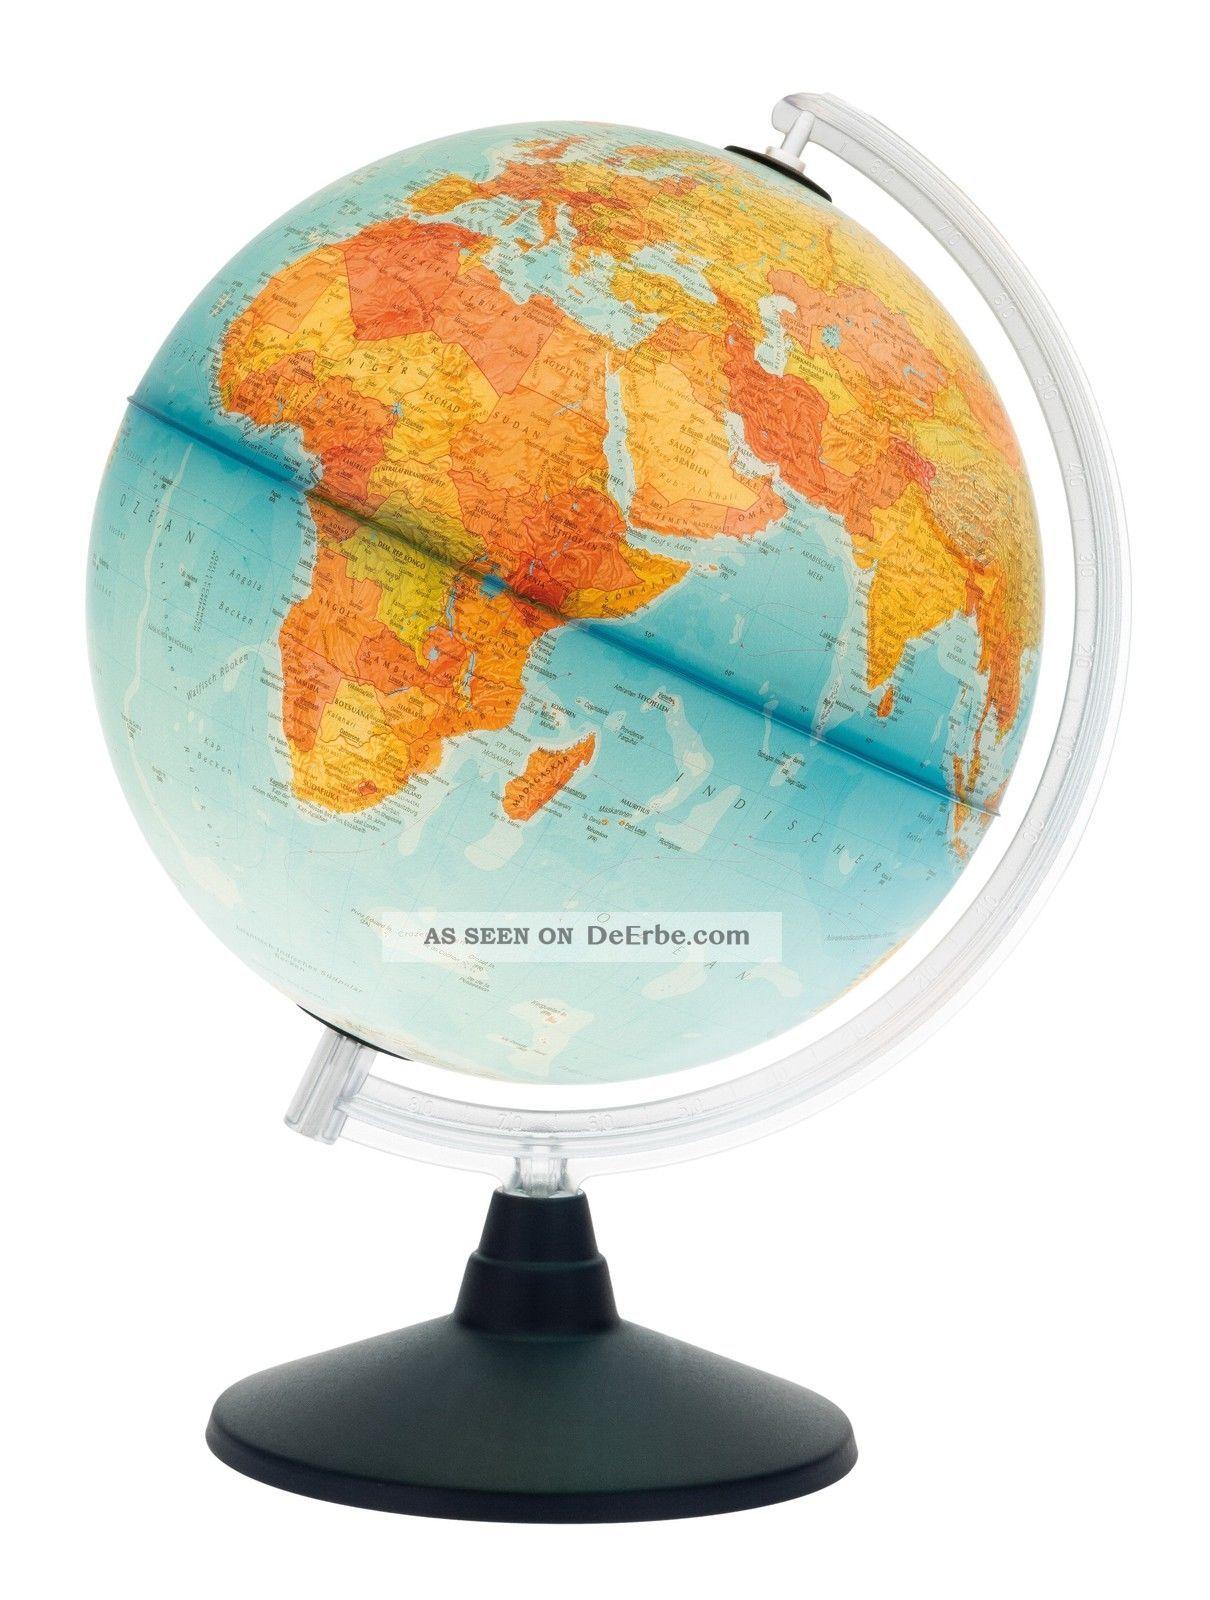 Tischglobus Weltkugel Beleuchtet Schülerglobus Lernglobus Leucht Globus Ø 30 Cm Astronom. Instrumente, Globen Bild